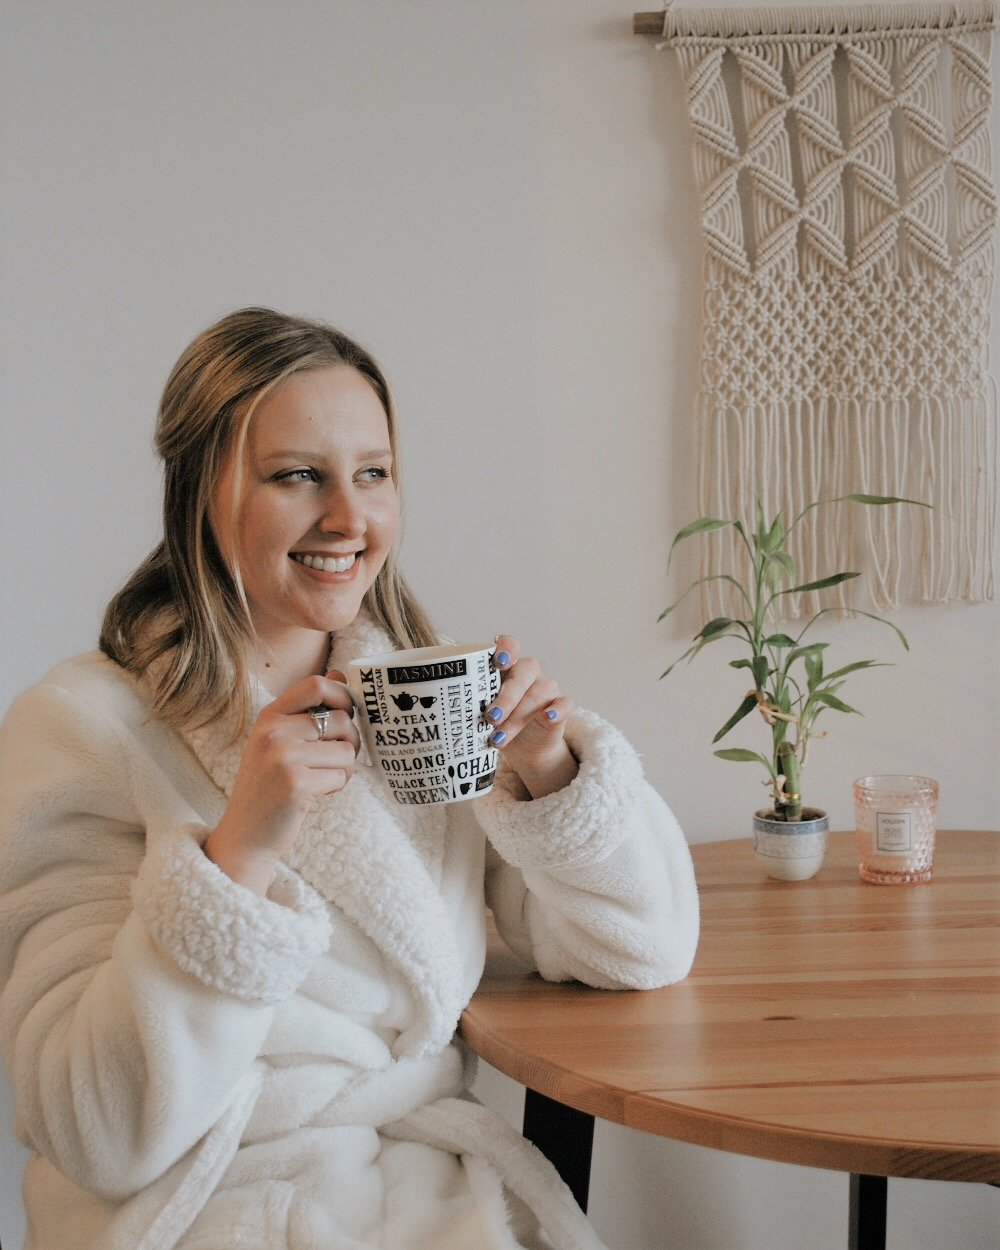 Blonde Woman Enjoying a Homemade Matcha Latte in the Morning